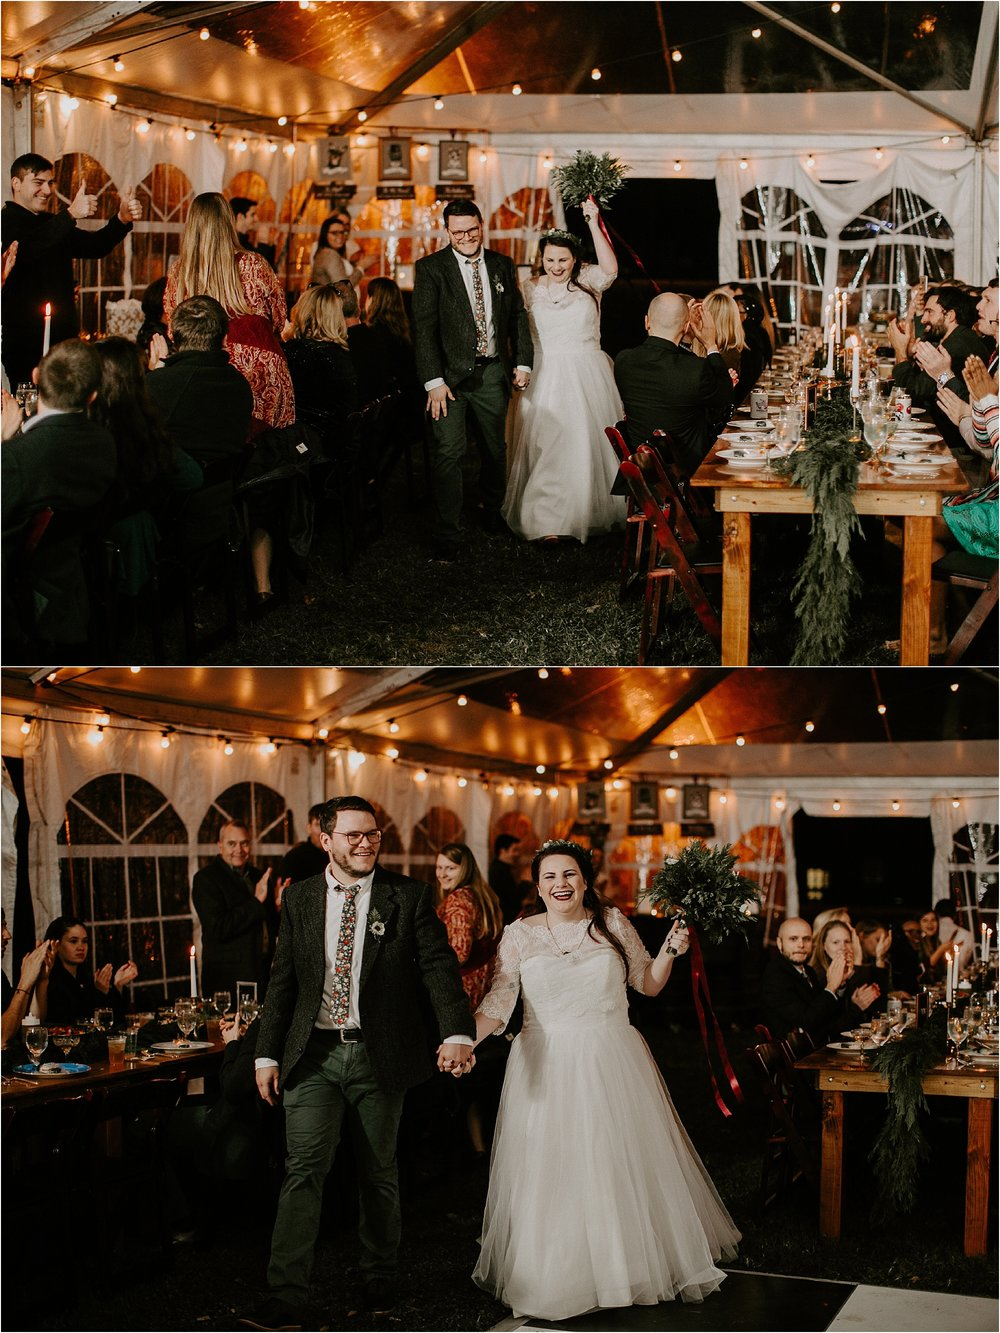 Sarah_Brookhart_Baltimore_Wedding_Photographer_0058.jpg